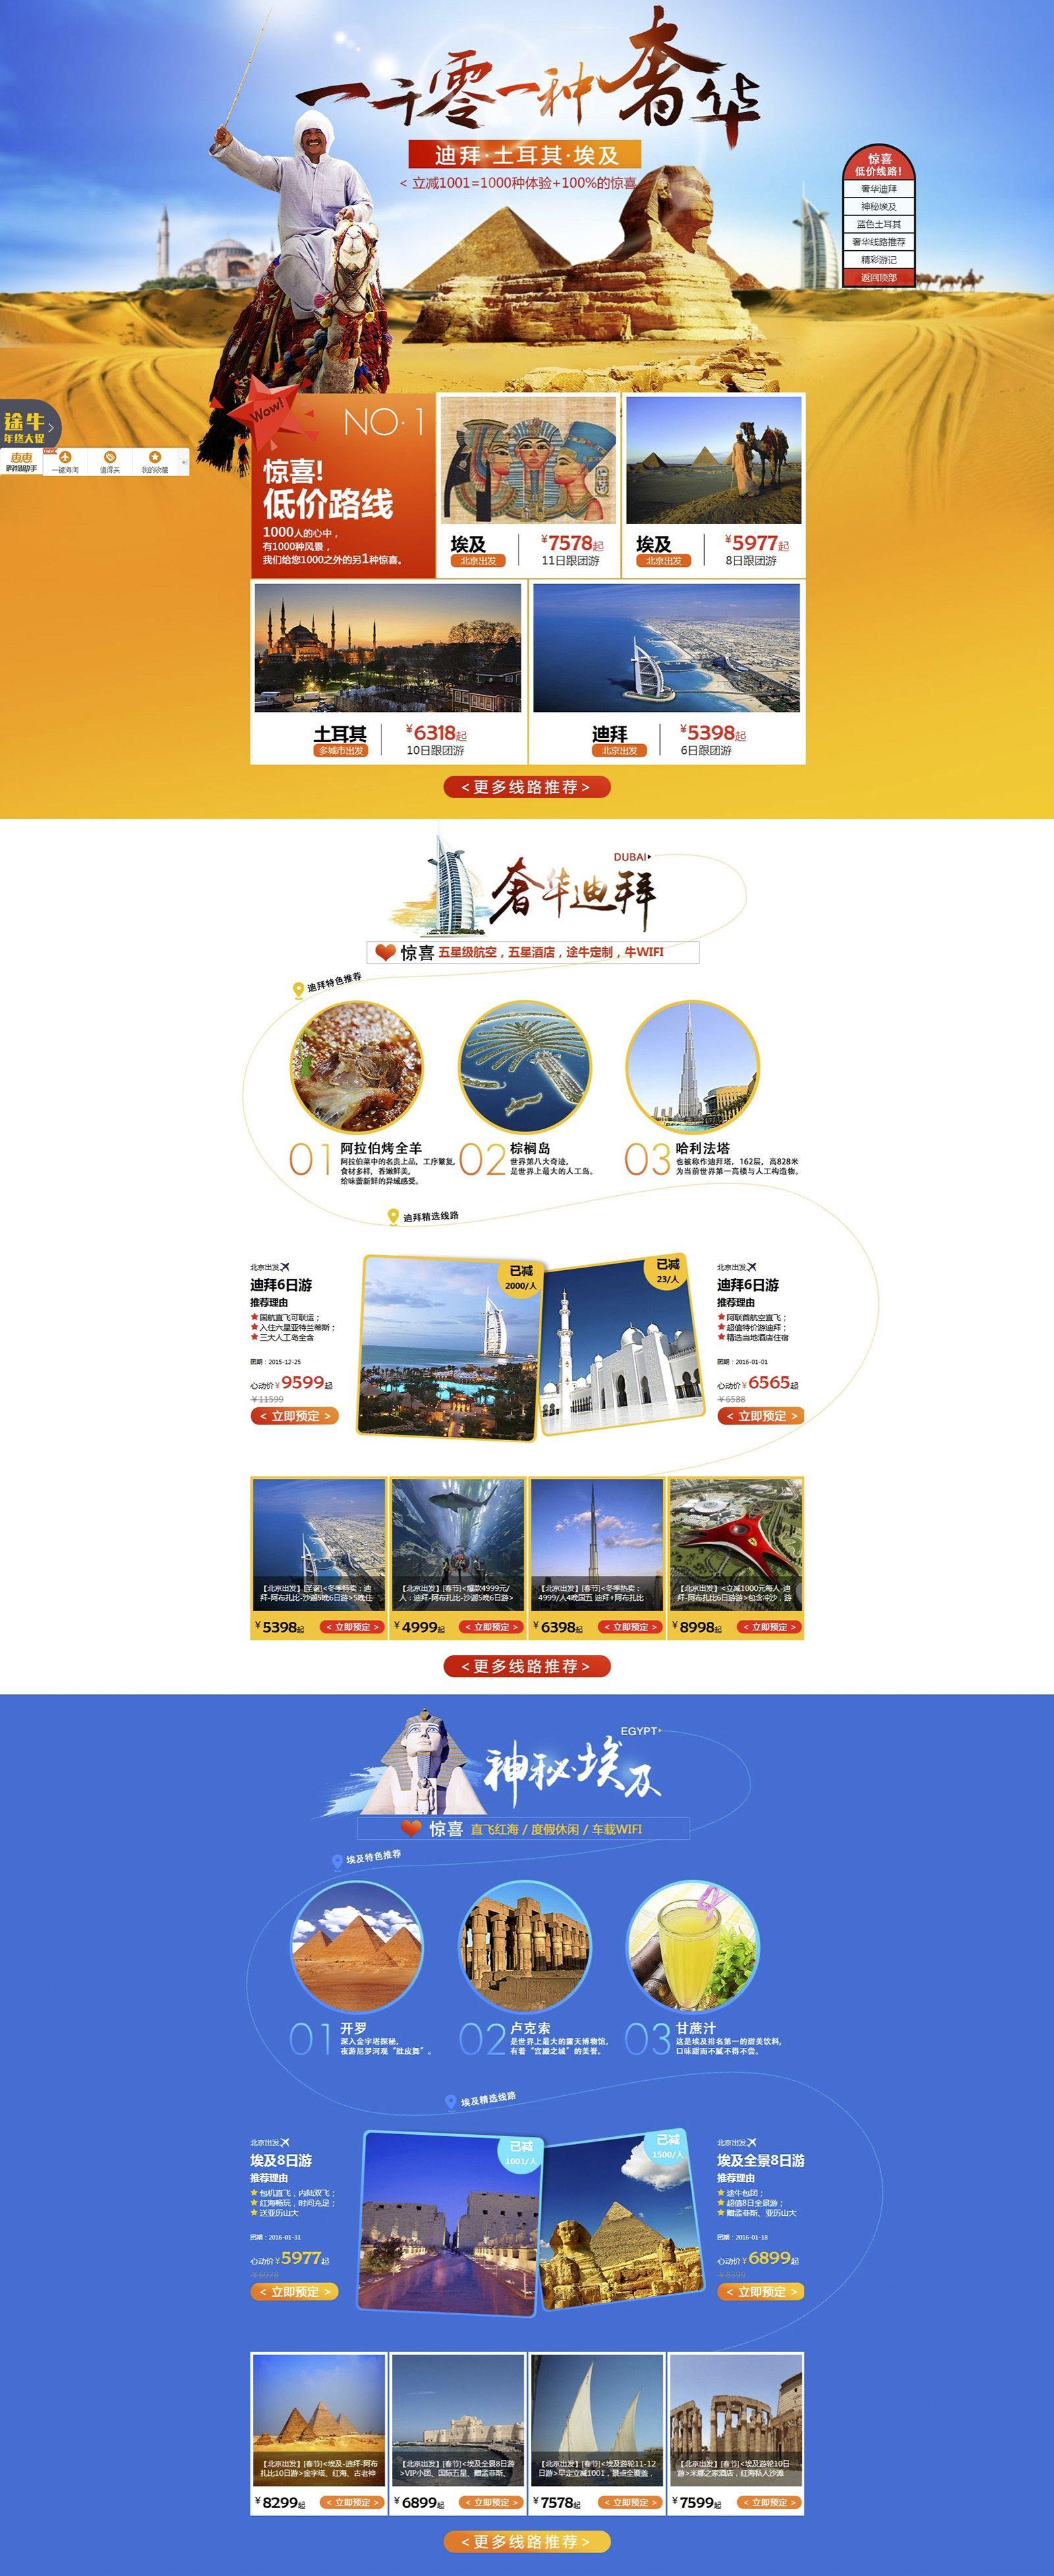 Tuniu Travel Website Midyear Promotion Dubai Egypt Tourism Special Web Design Chinese Web Design With Images